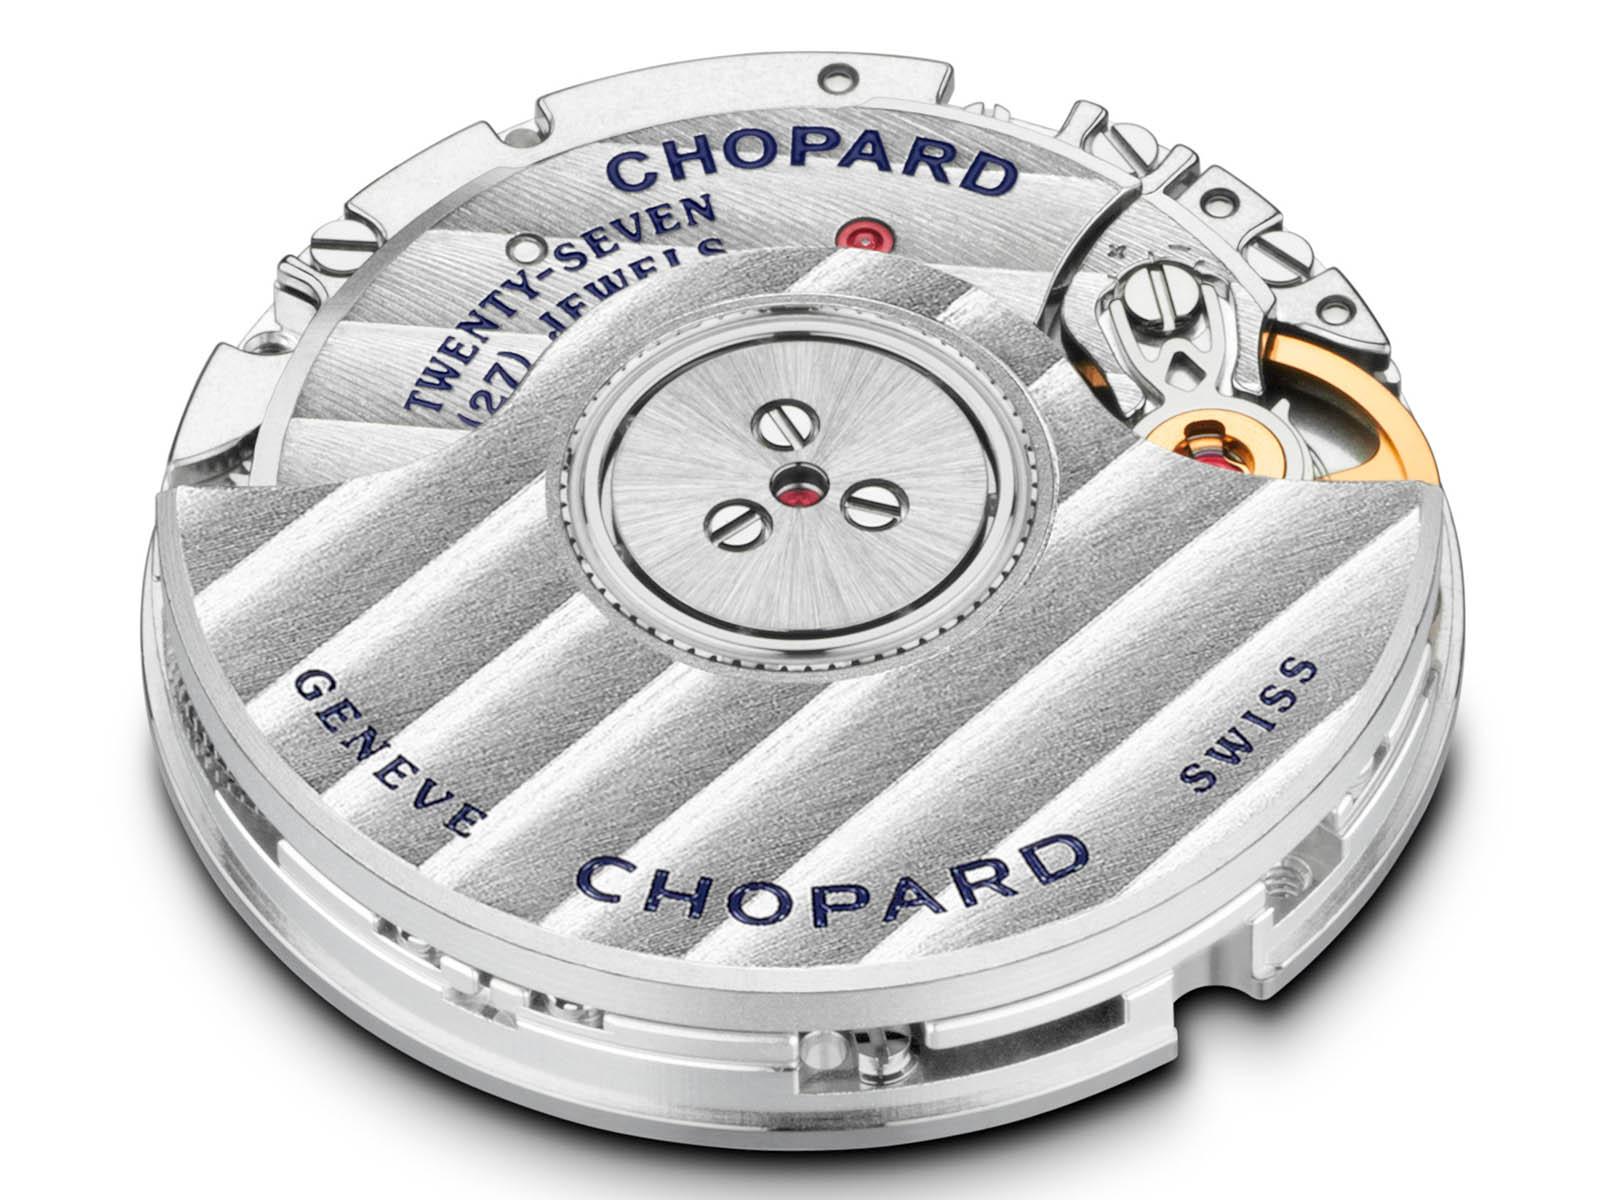 chopard-alpine-eagle-movement-09-01-c.jpg